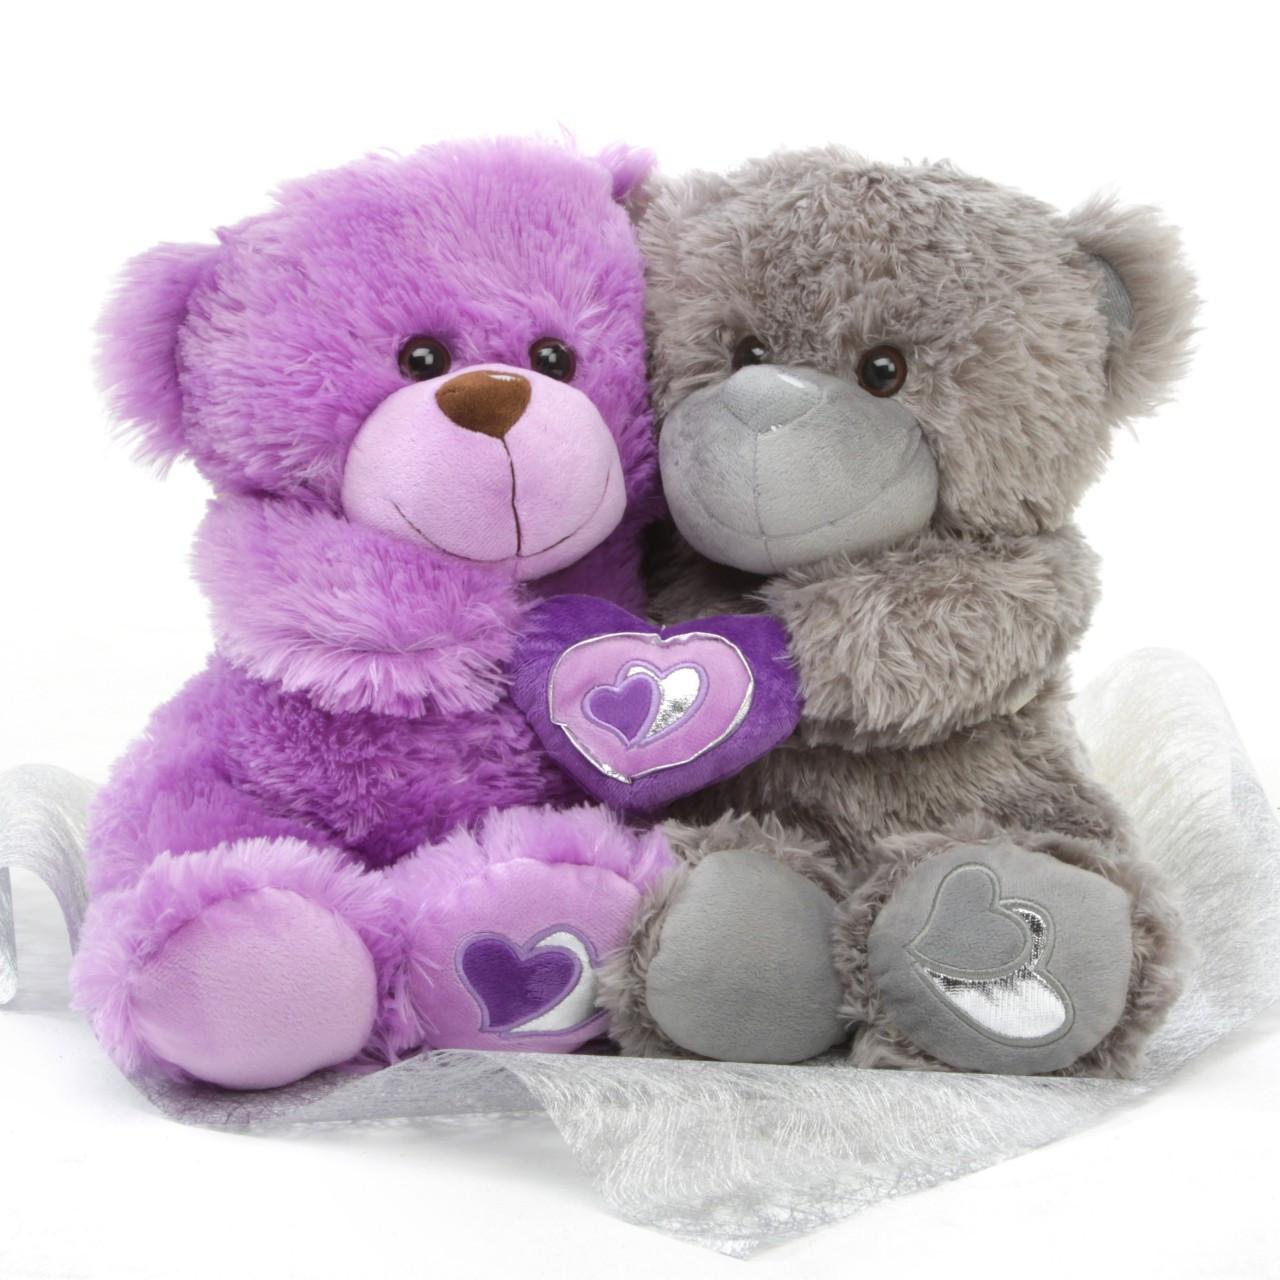 Ultimate soulmates bear hug care package featuring 18 sewsie ultimate soulmates big love bear hug care package 18in voltagebd Images